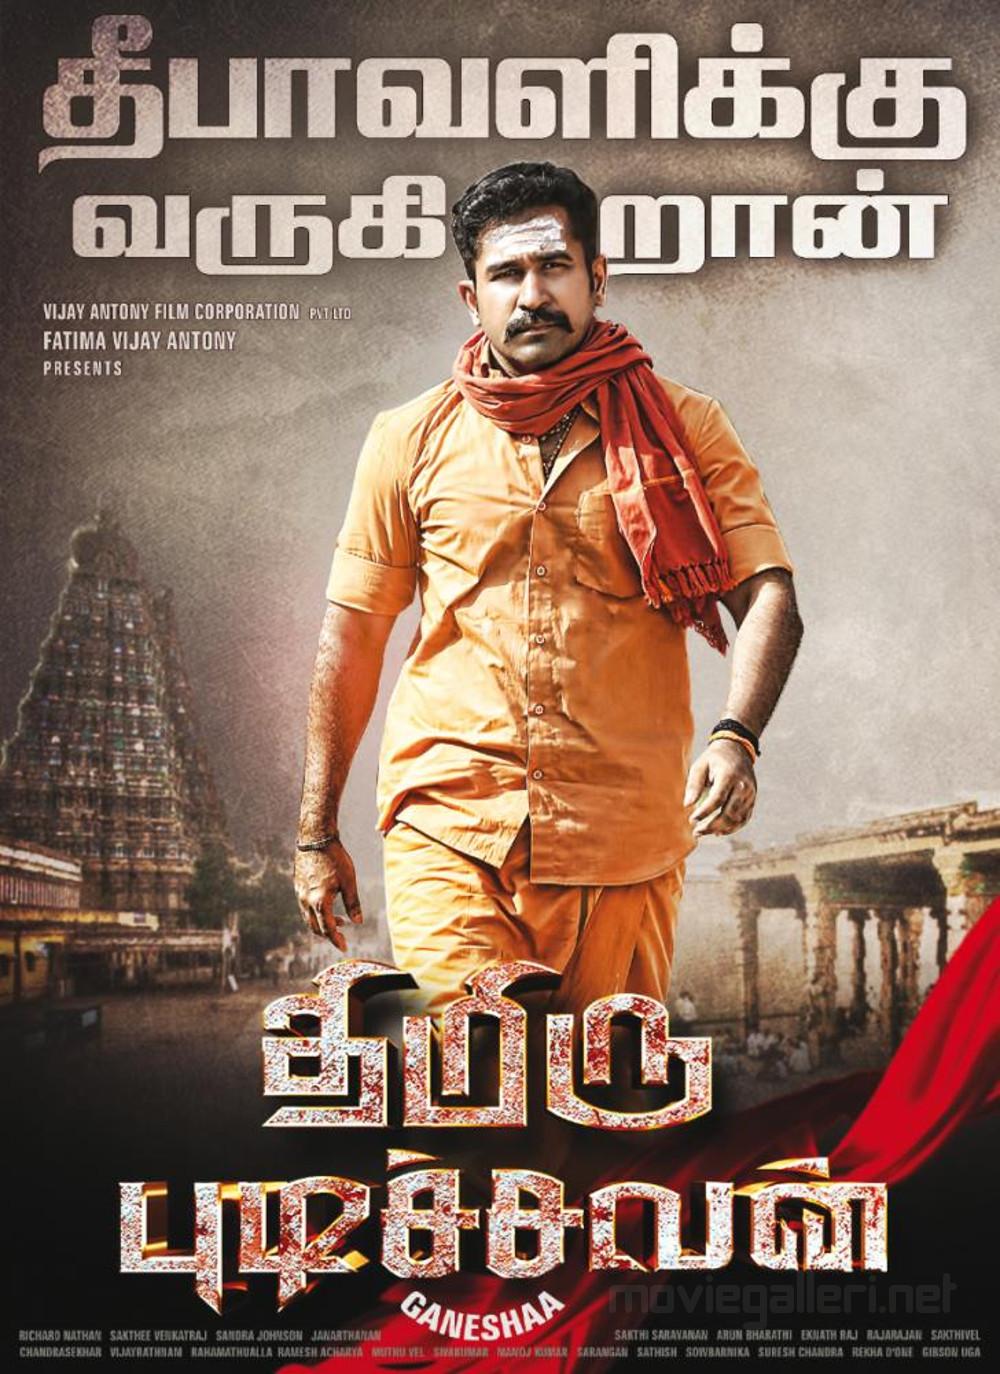 Vijay Antony Thimiru Pudichavan Movie Deepavali Release Poster